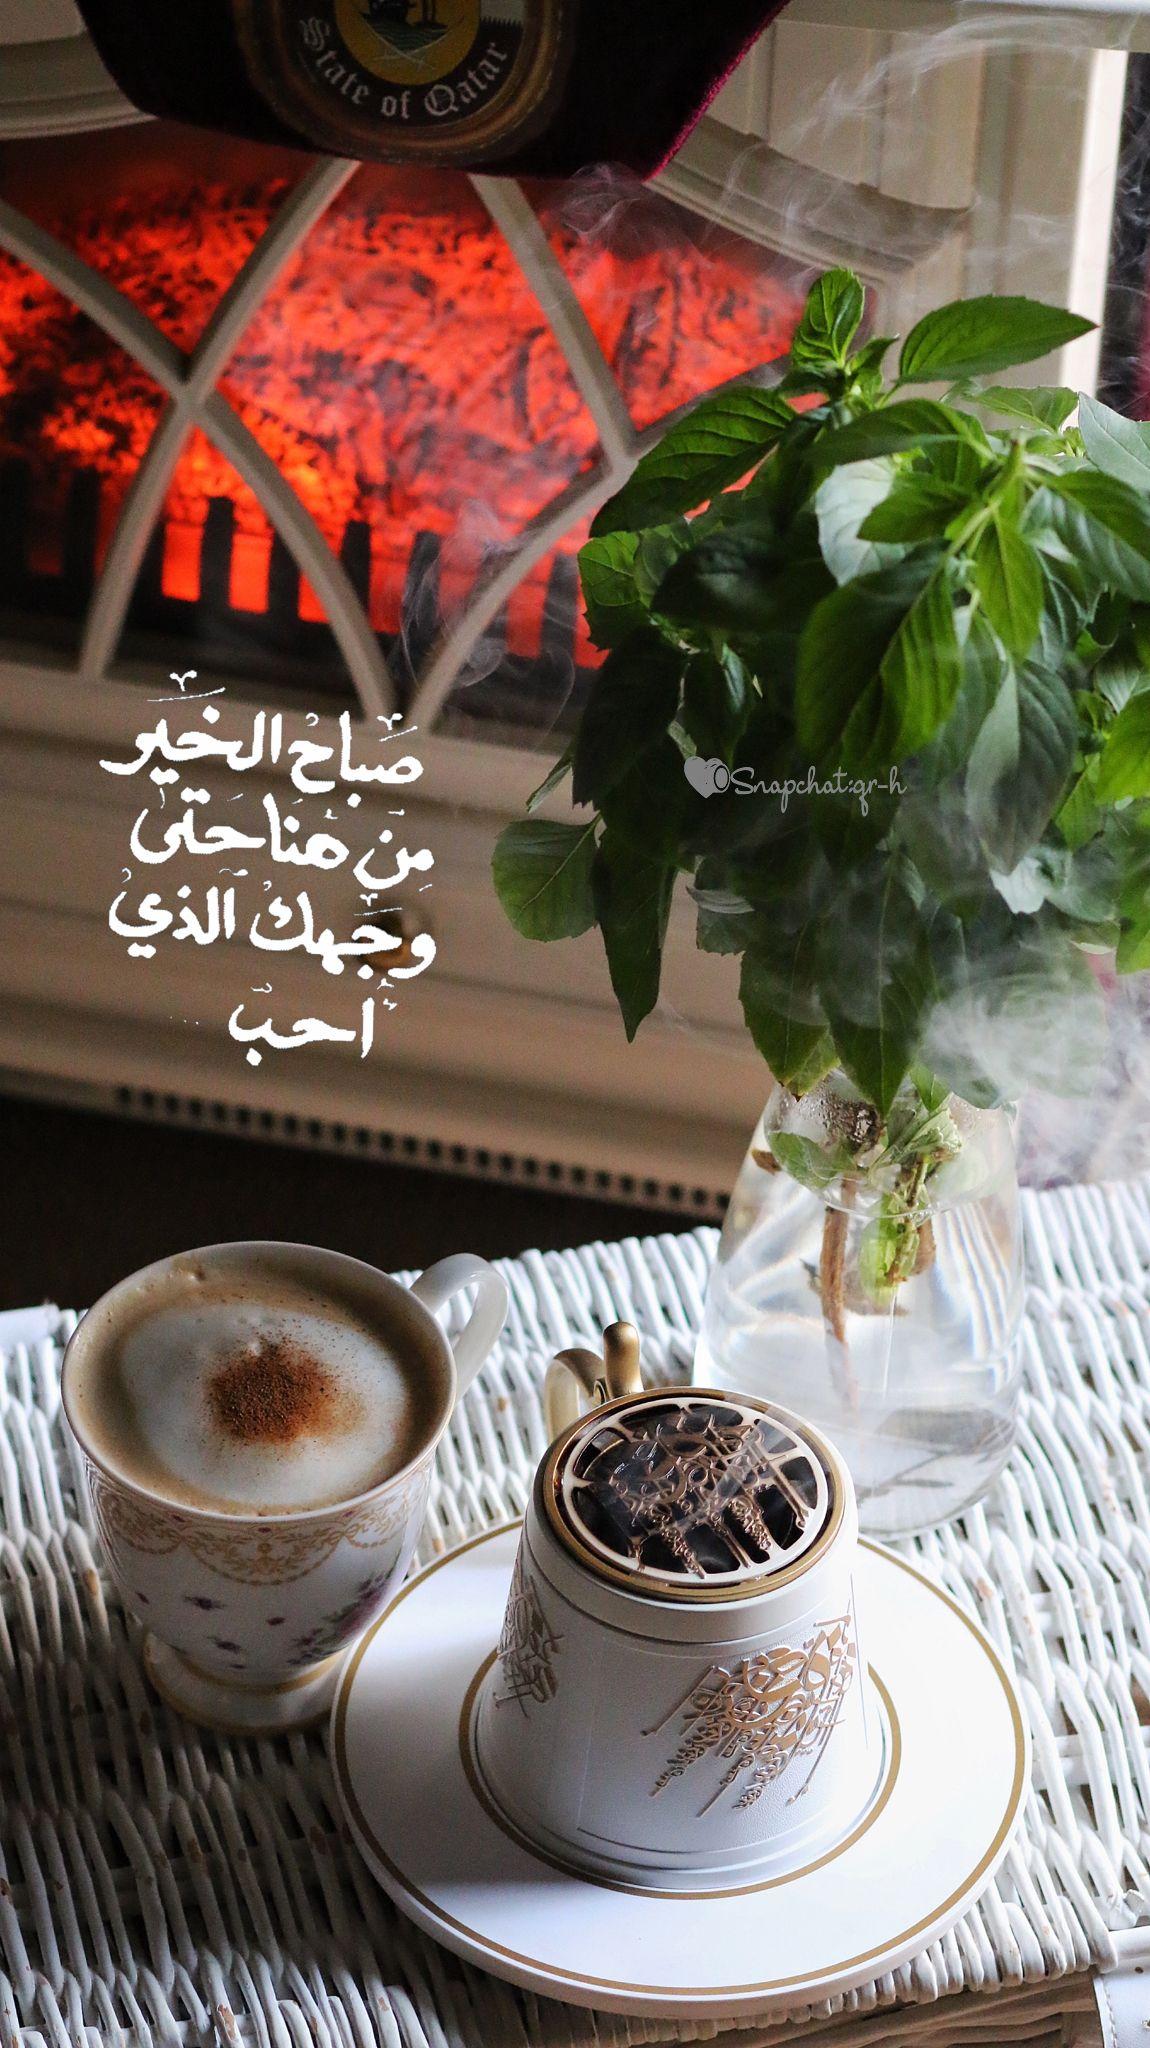 Pin By أنقى المشاعر On صباحيات Beautiful Morning Islamic Love Quotes Imgfave